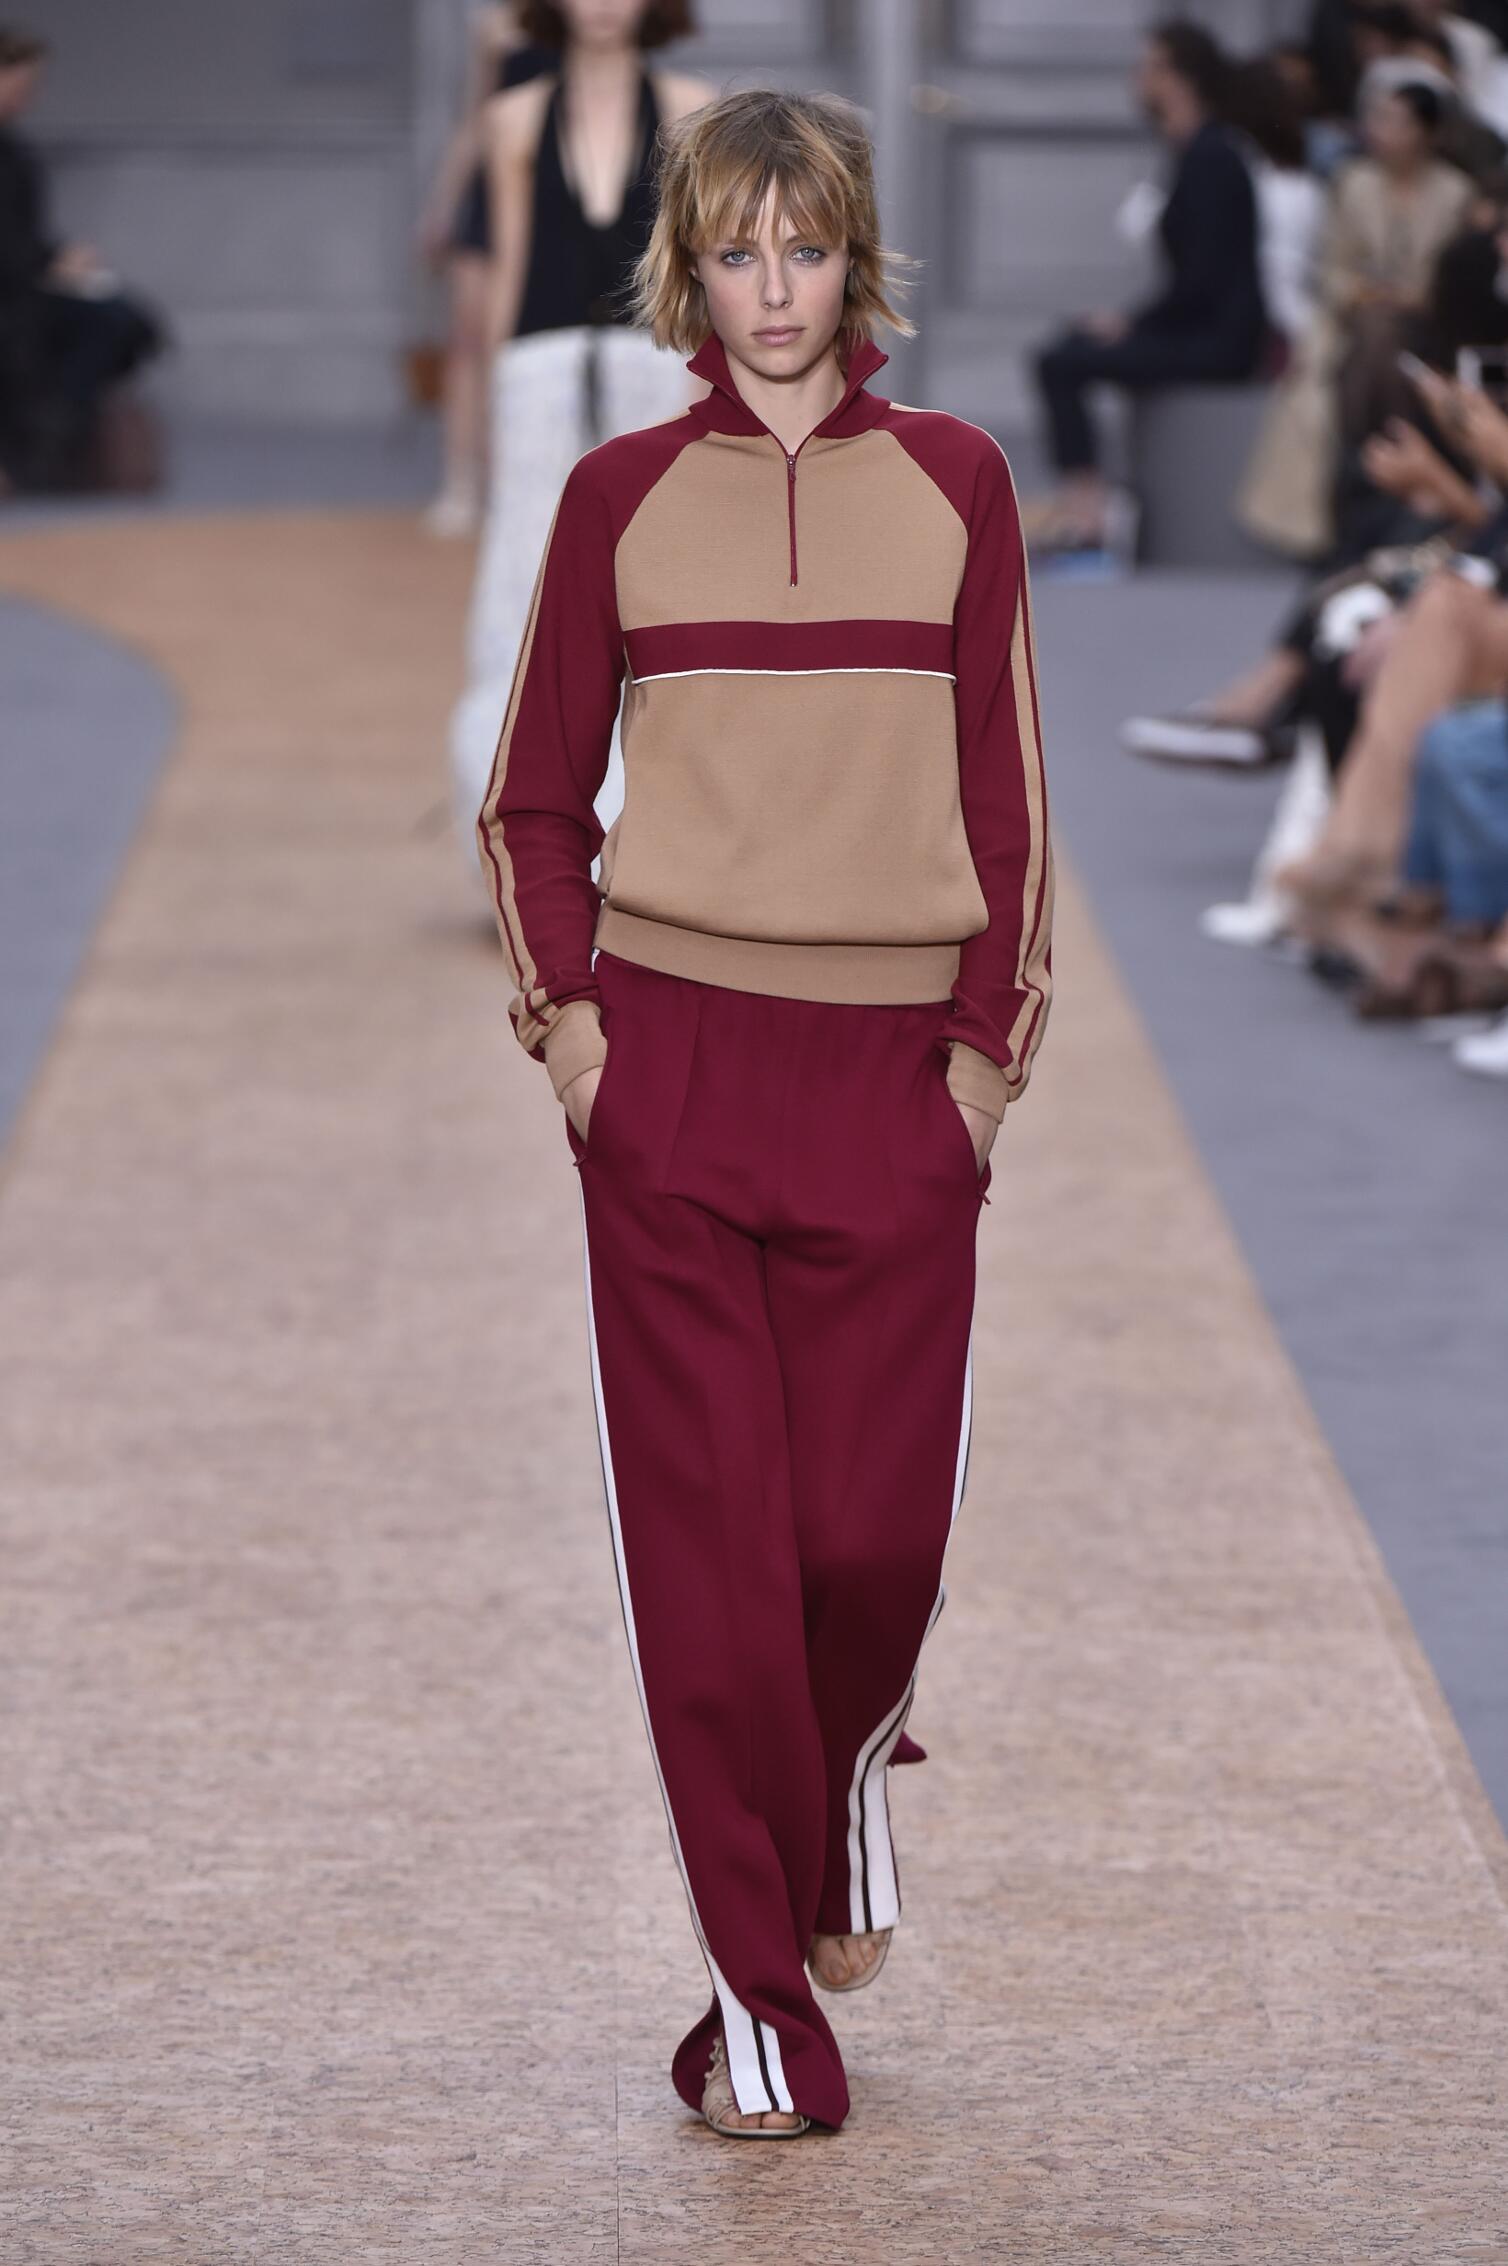 Models Fashion Show Chloé